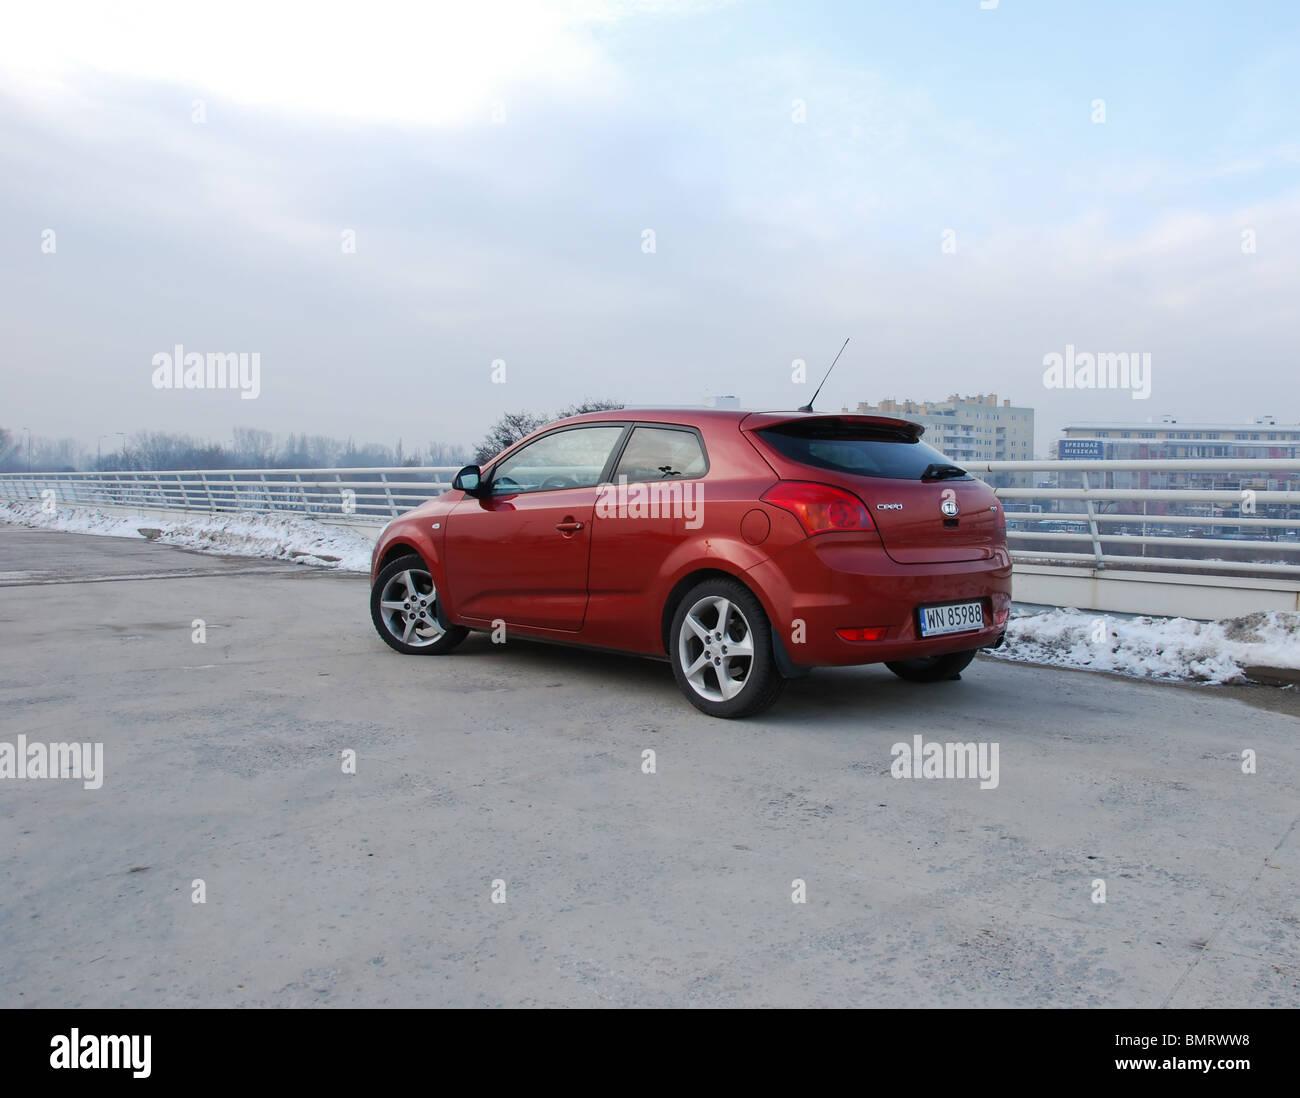 Kia Pro Ceed 1 Stock Photos Images Alamy 16 Crdi My 2009 Infra Red Metallic 3d